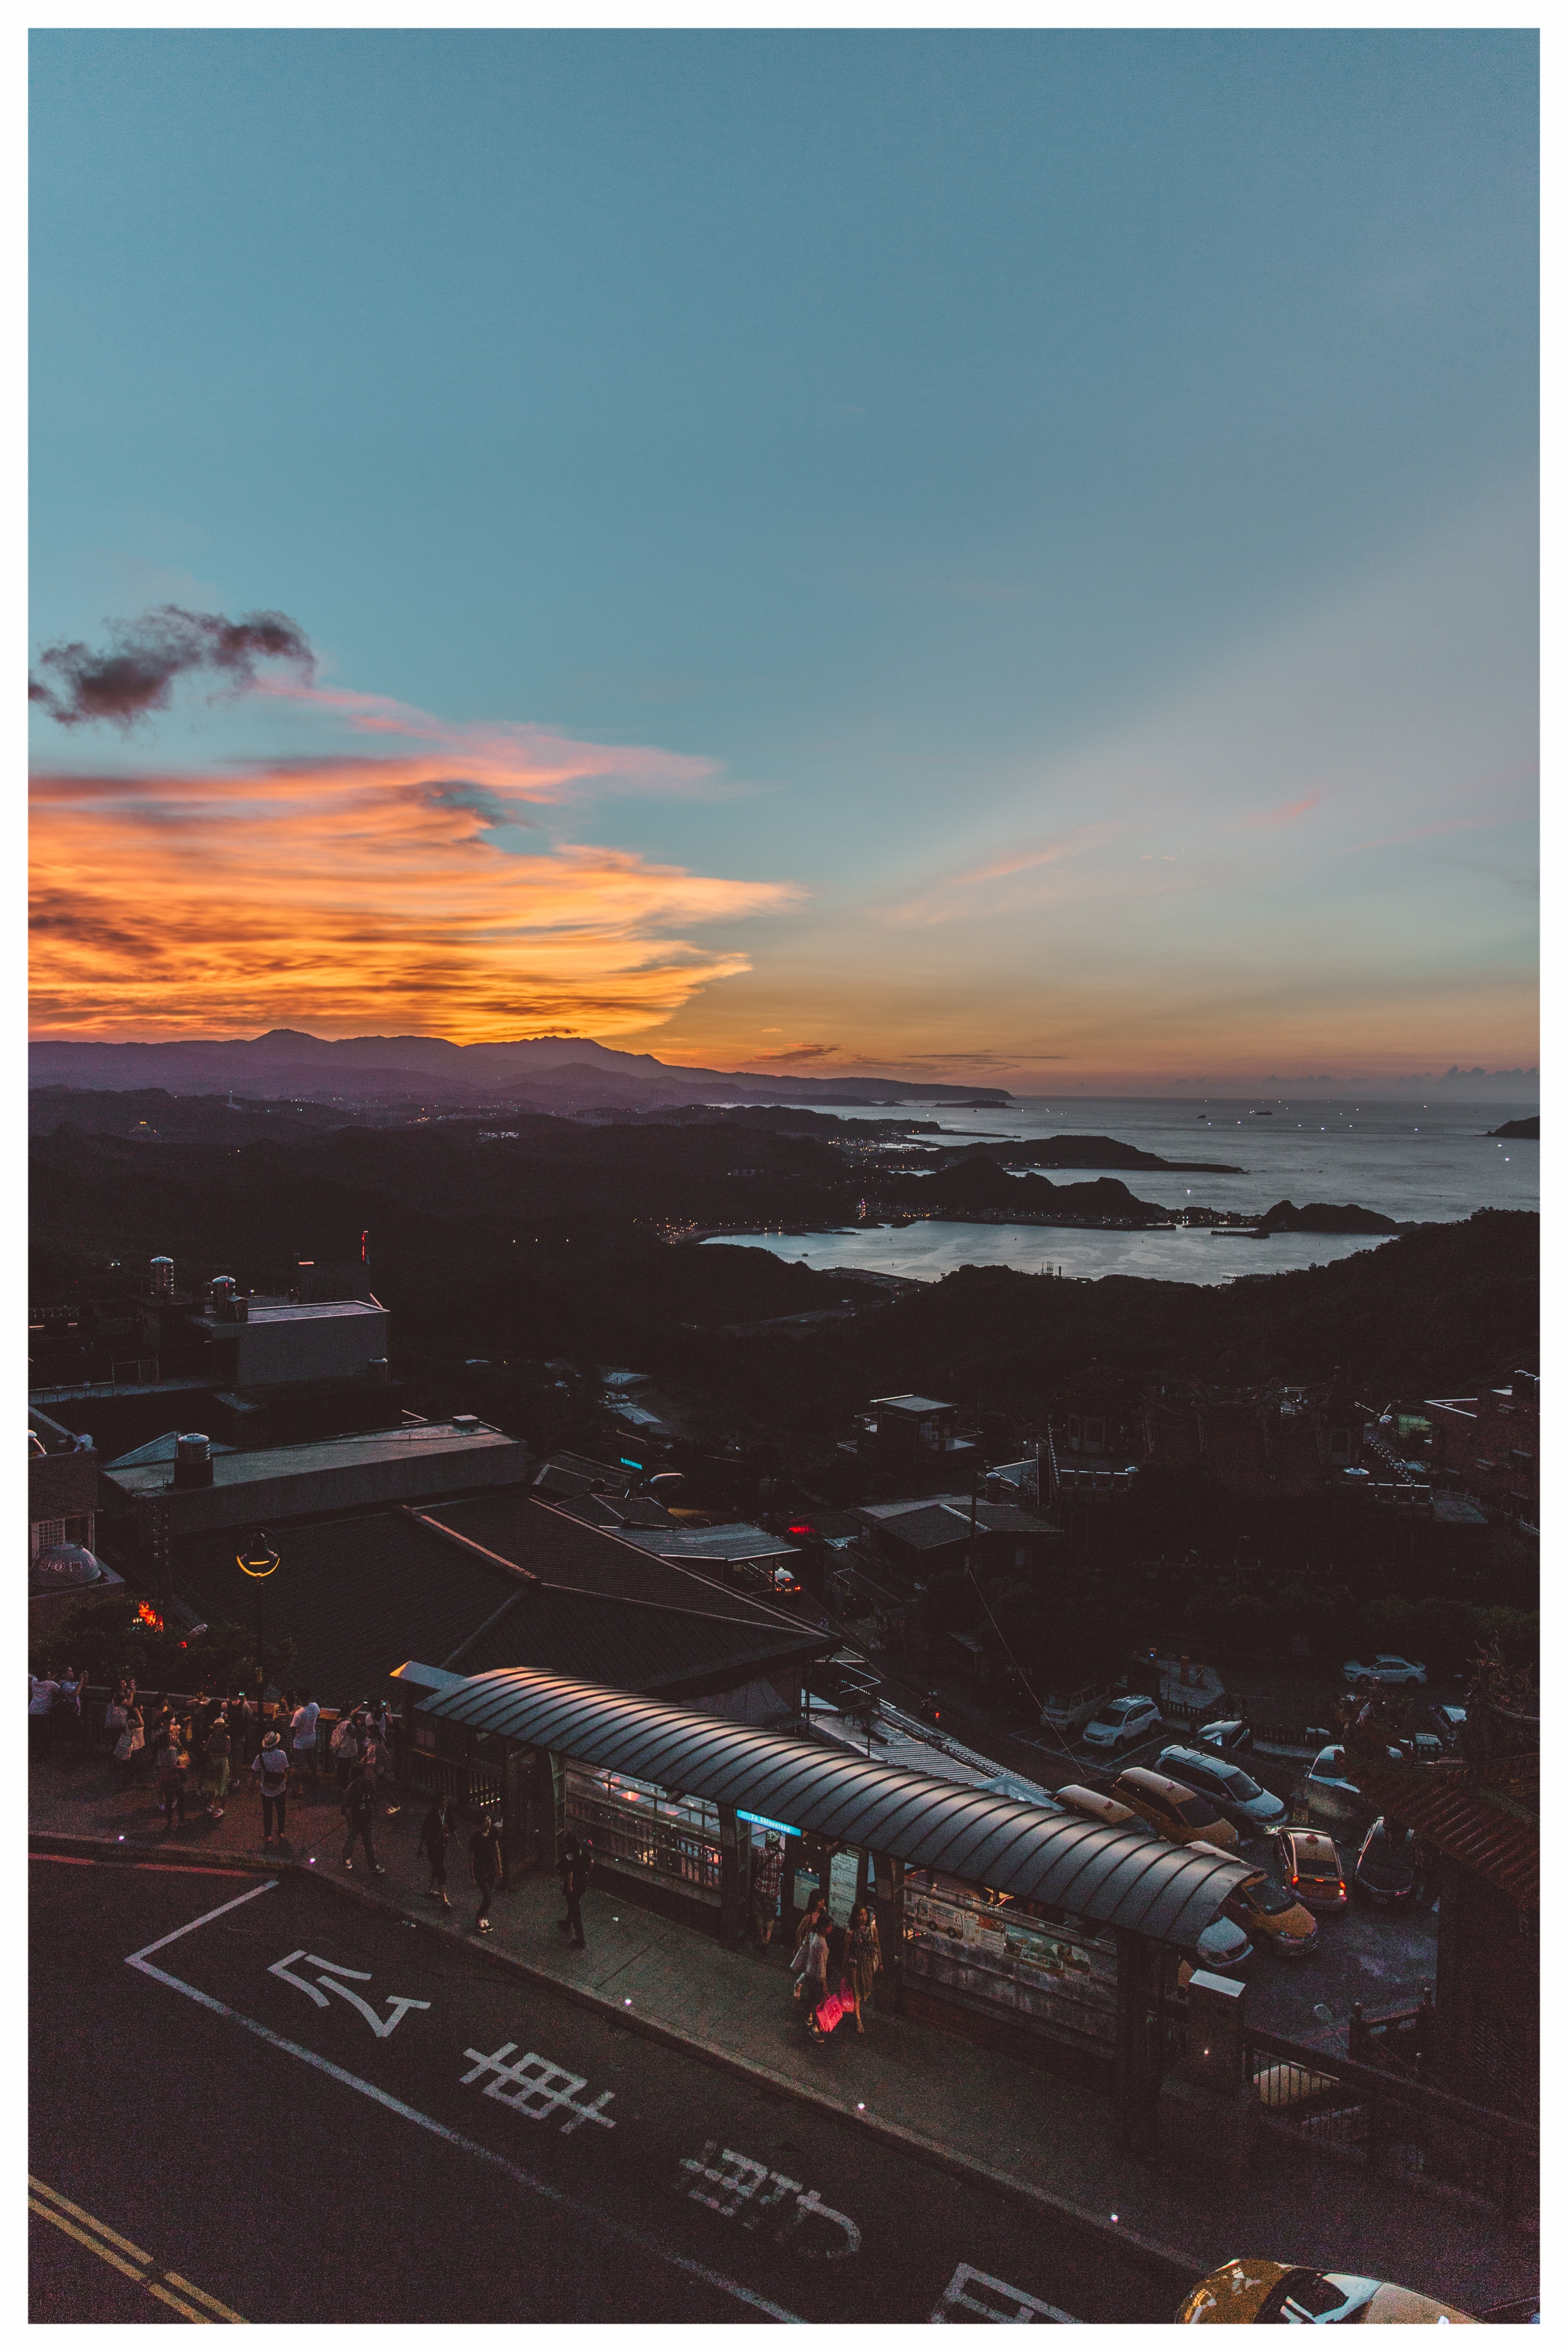 Sunset at Jiu Fen